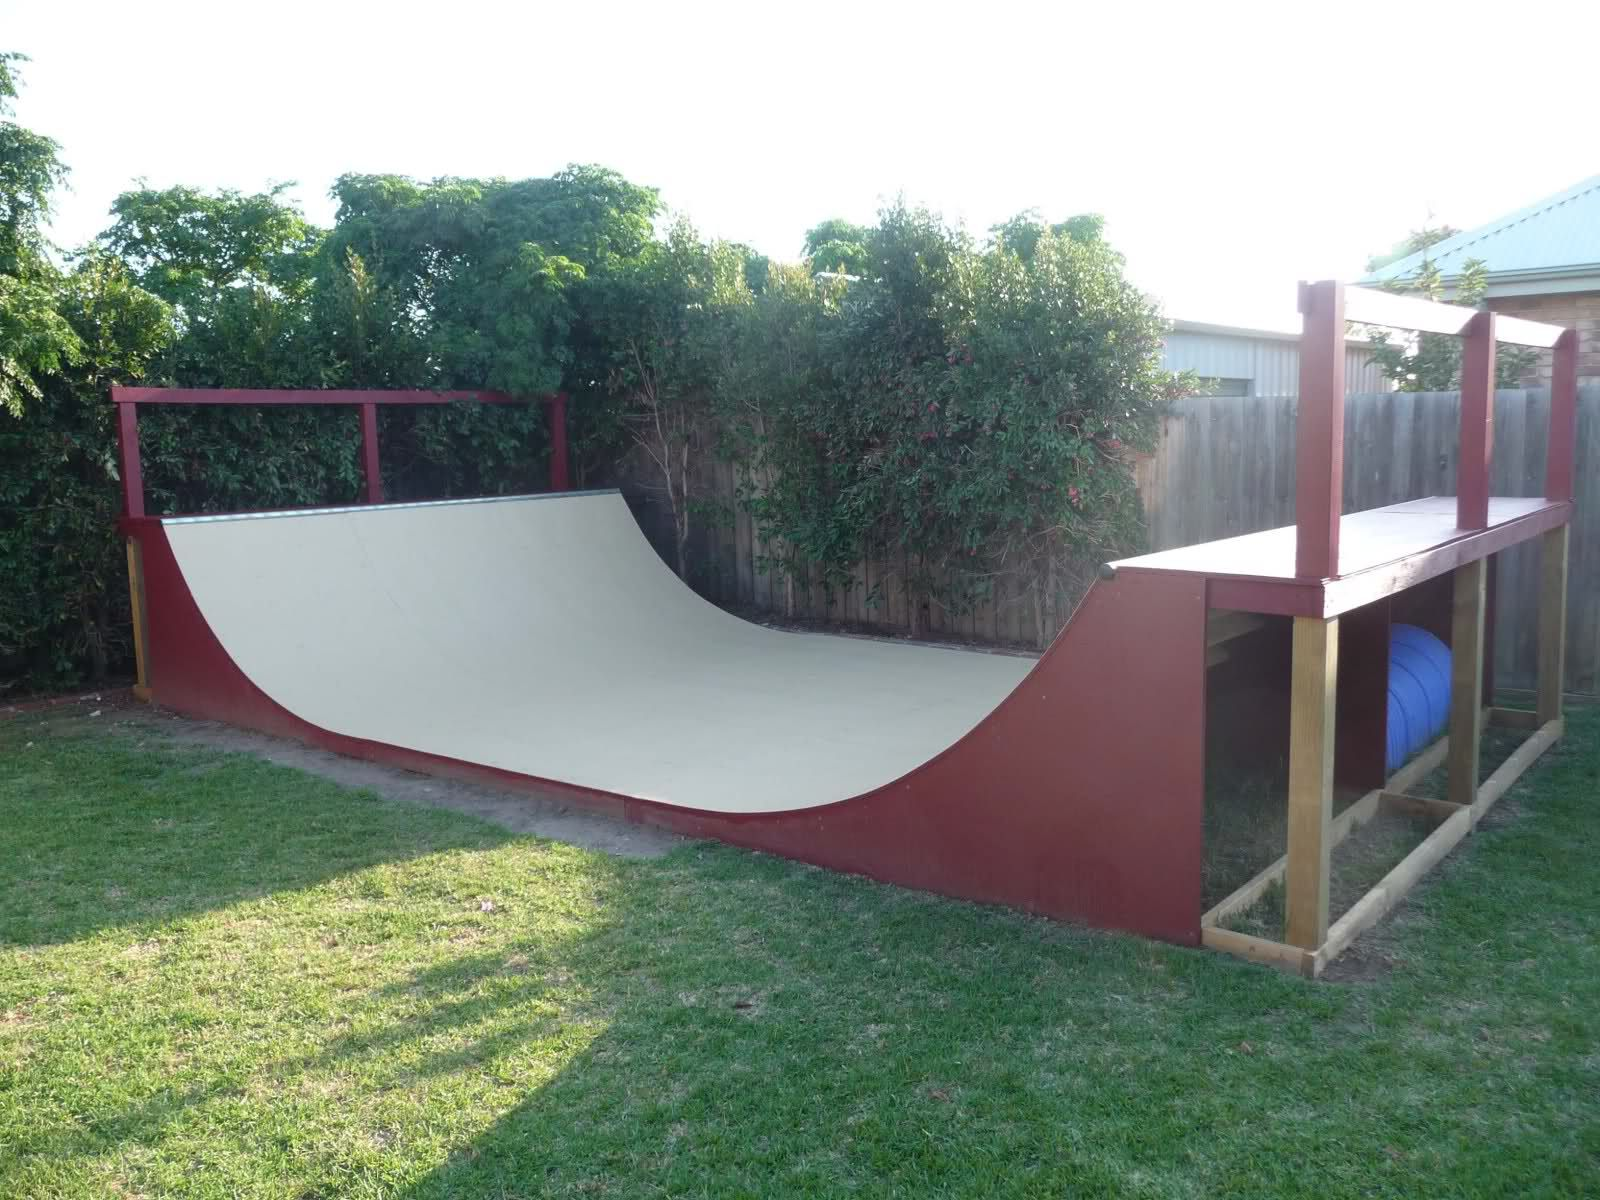 Had To Make A Start Mini Ramp Ramp Design Backyard Skatepark Backyard mini ramp for sale